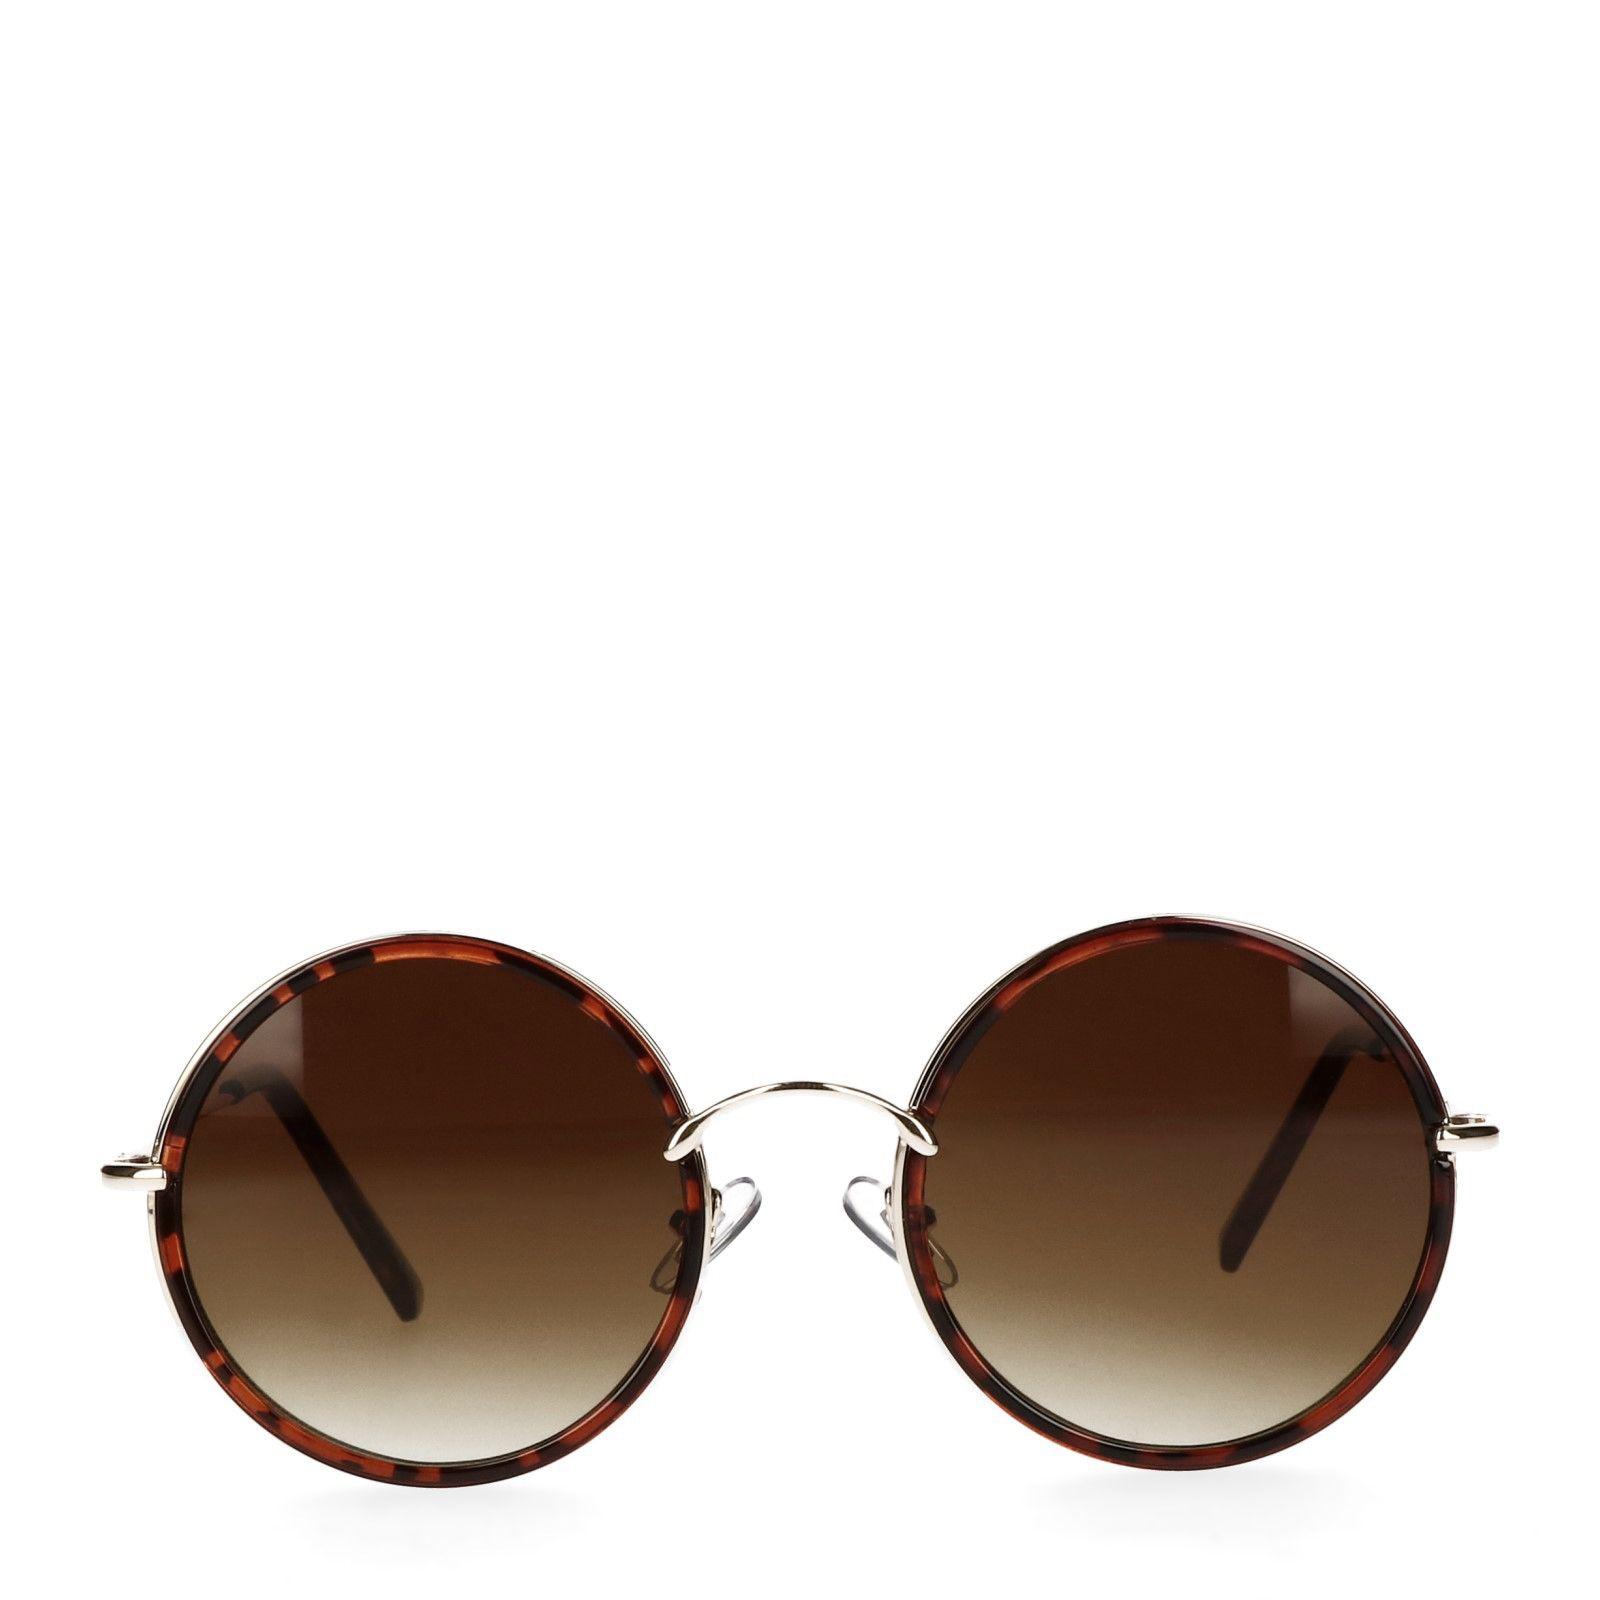 Ronde retro zonnebril bruin